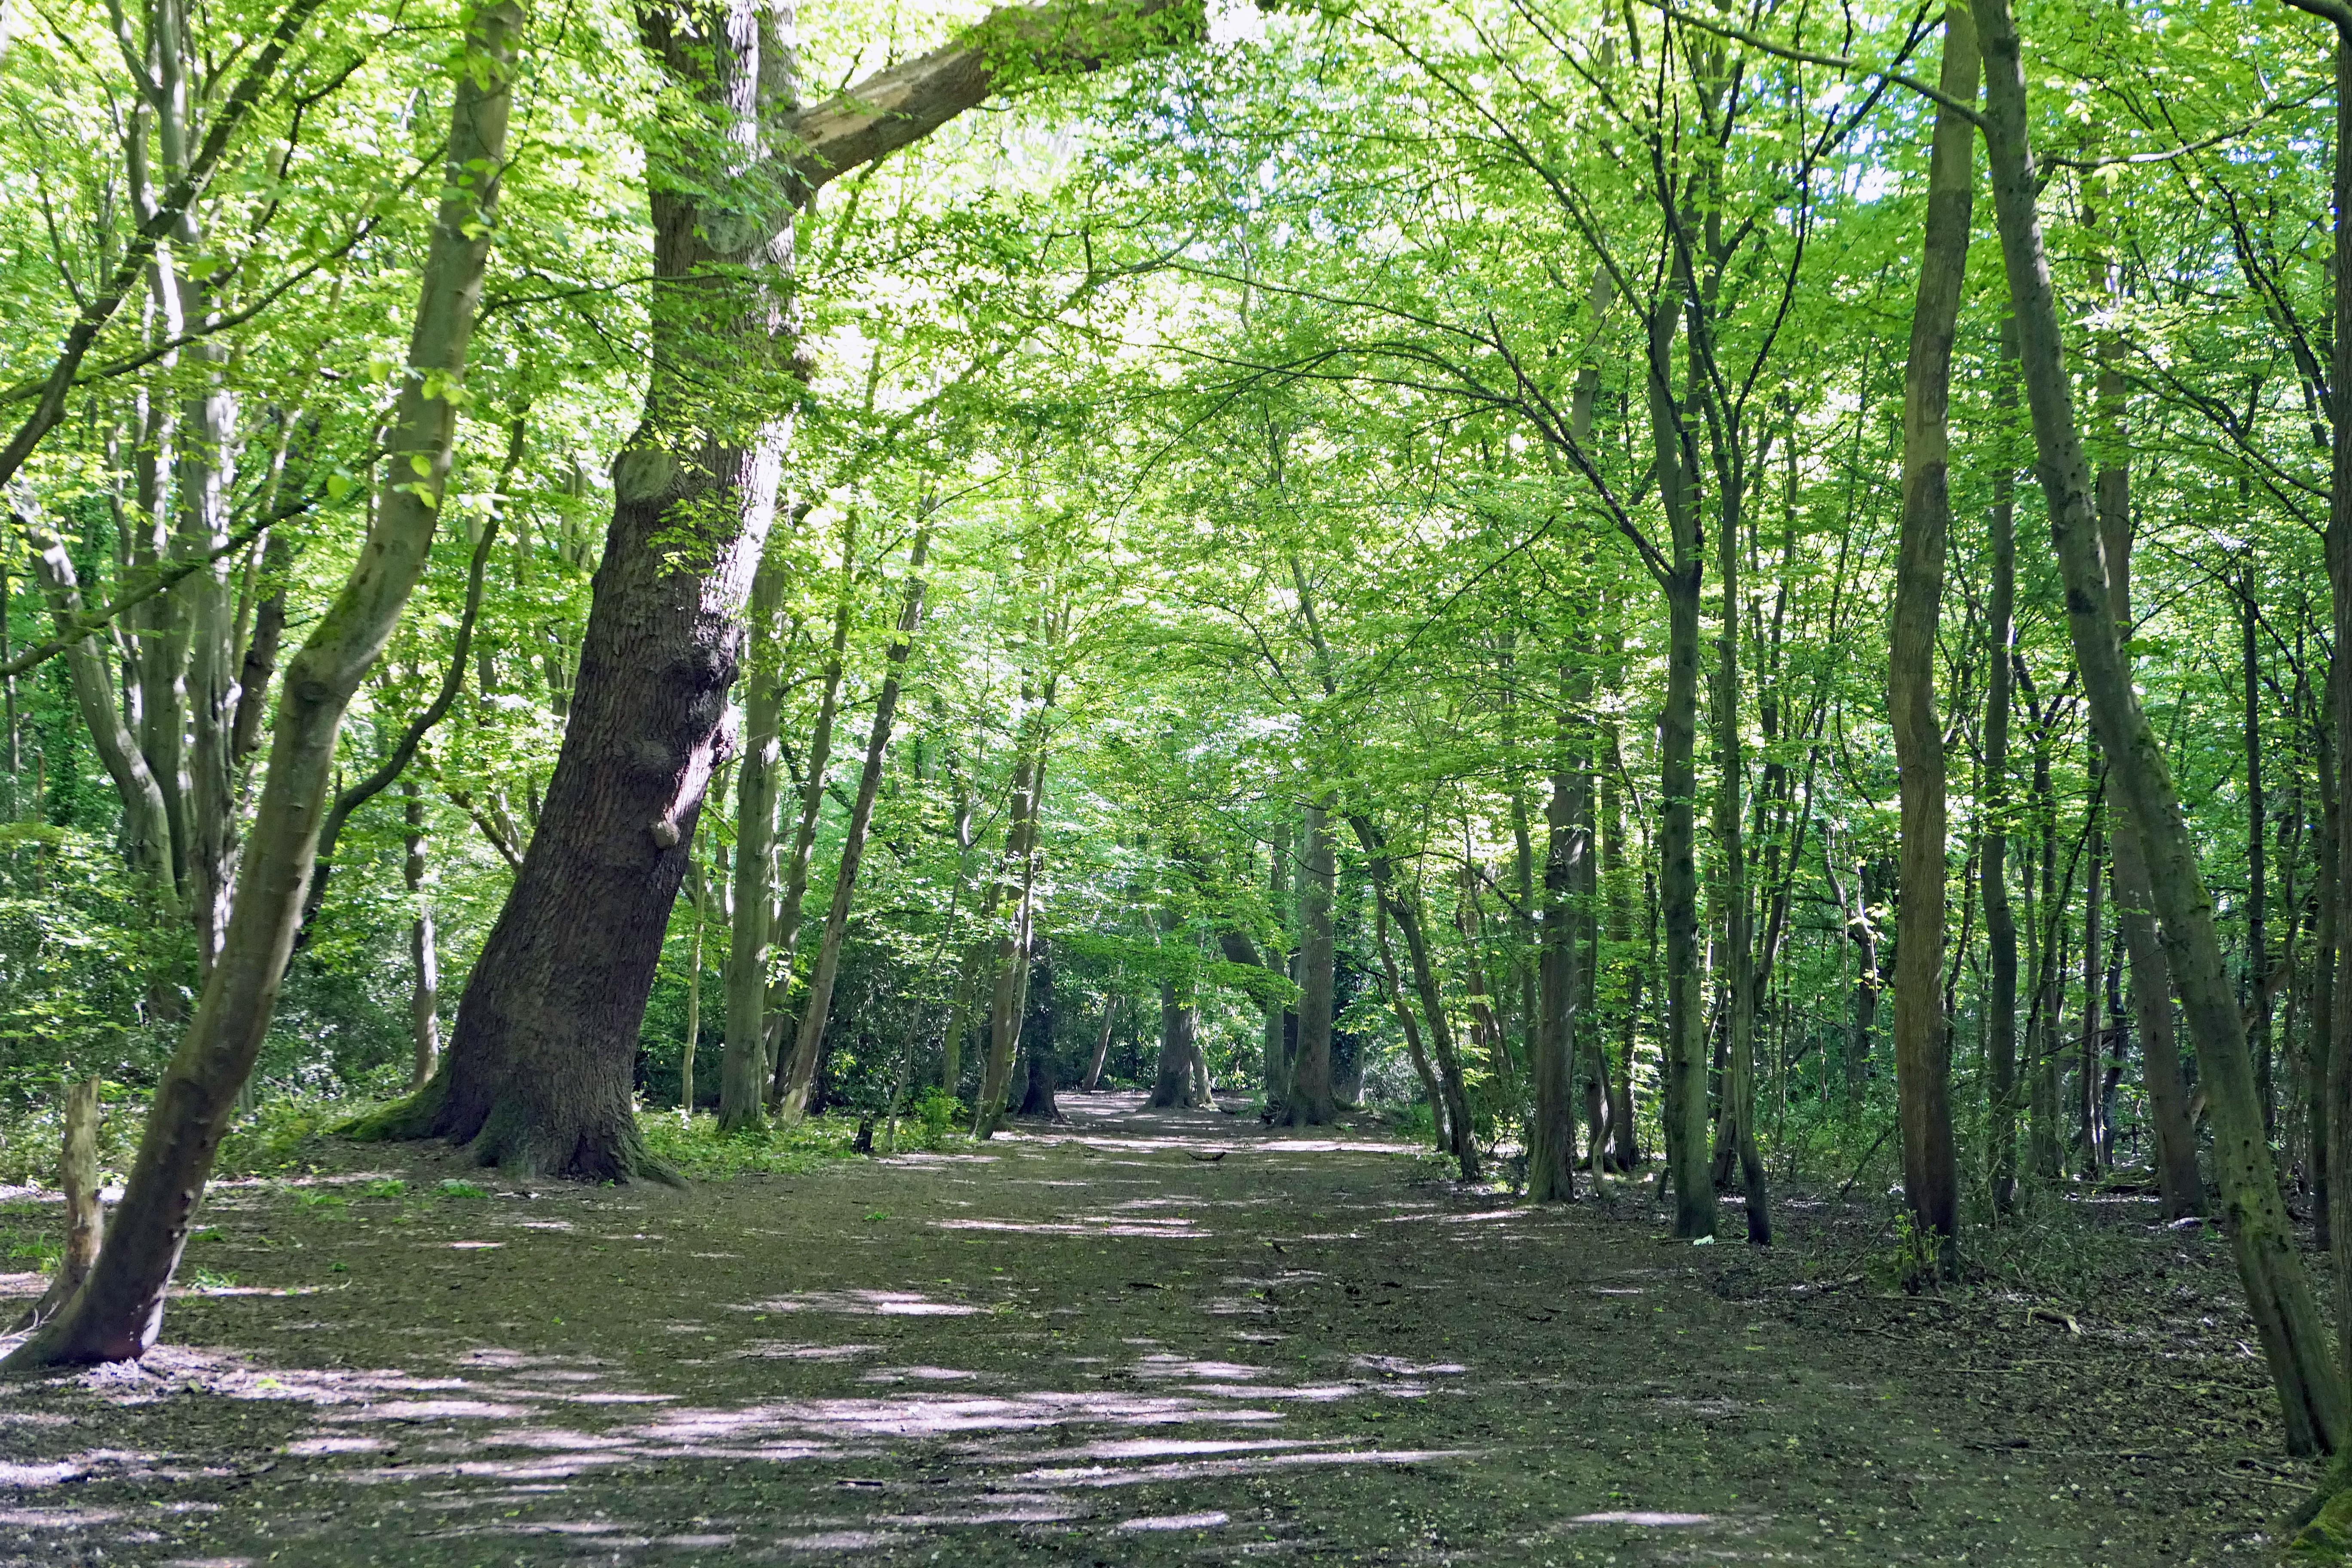 Whitewebbs Main path